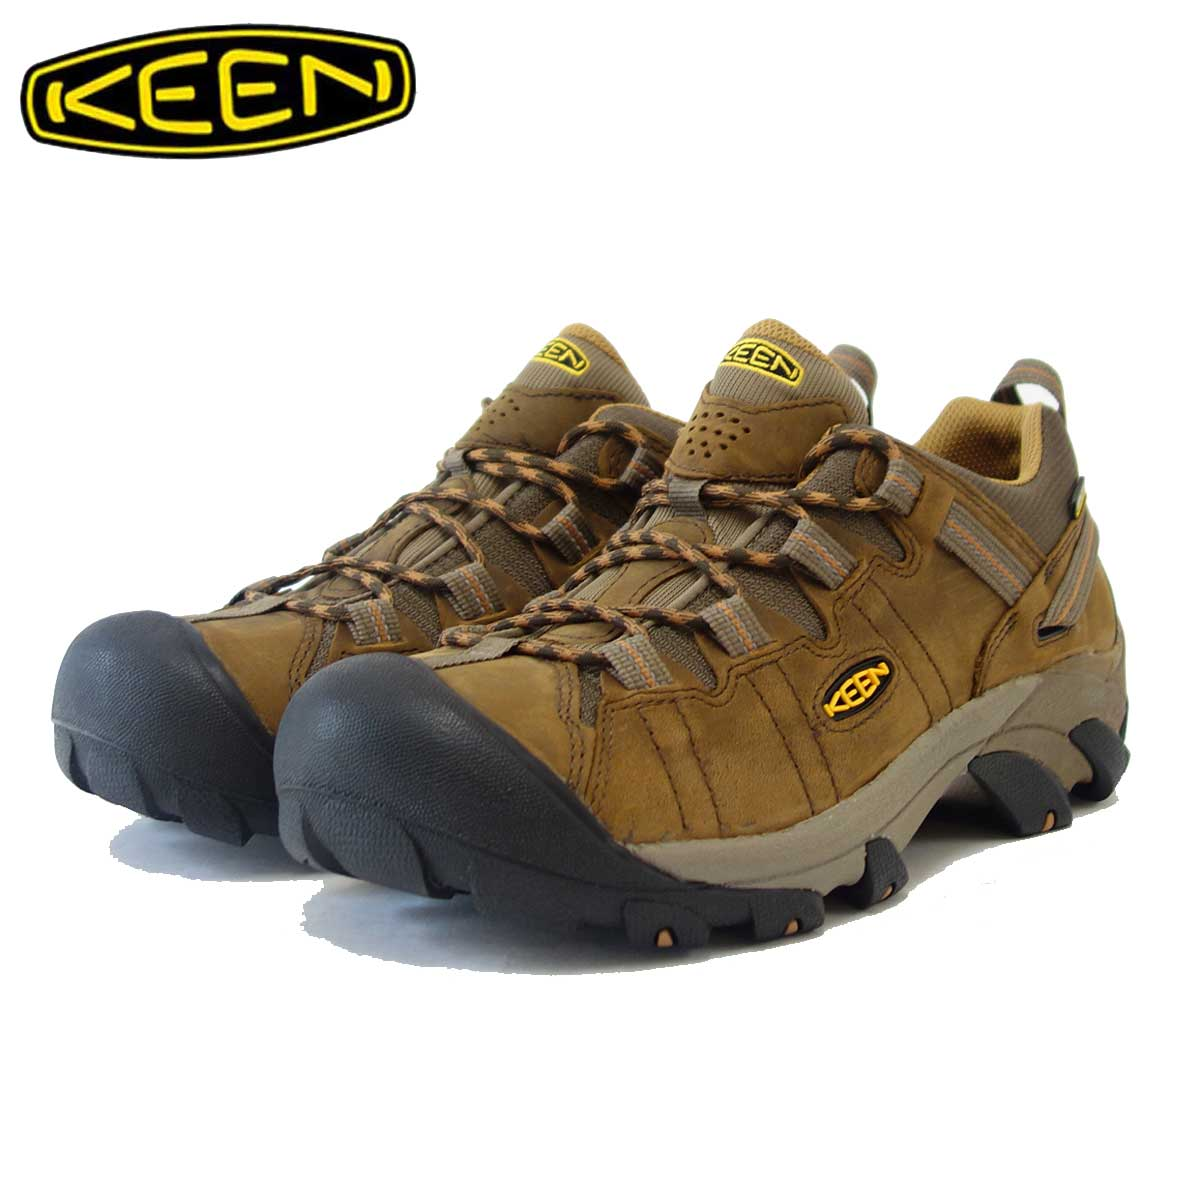 KEEN キーン TARGHEE II ターギー2 1010125(メンズ)カラー:Cascade Brown/Brown Sugar 防水タイプのハイブリッドハイキングシューズ 「靴」